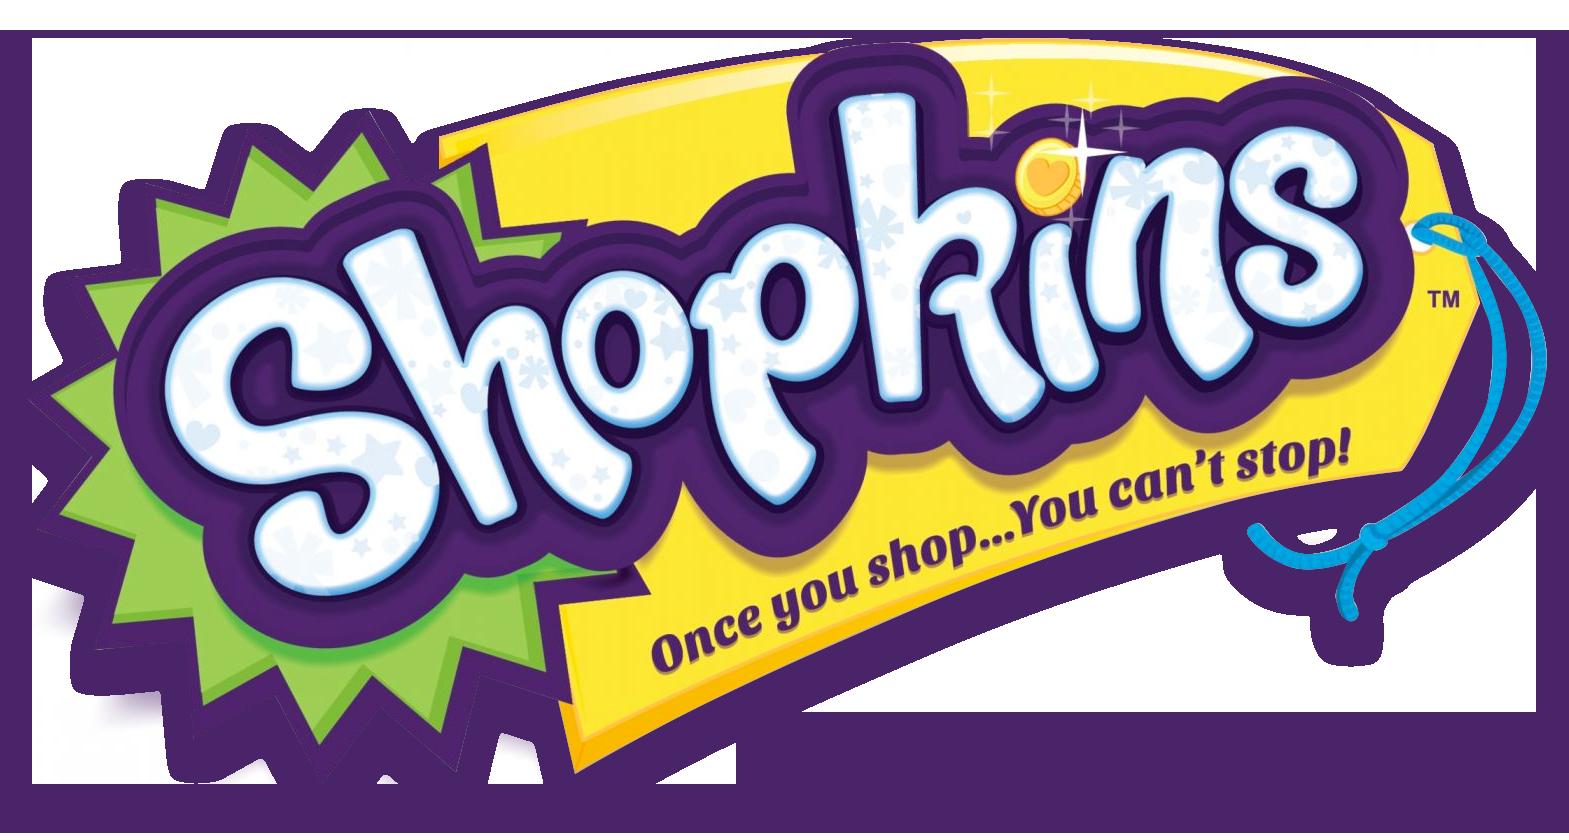 Shopkins logo clipart image download Shopkins Logo | Shopkins | Pinterest | Shopkins, Logos and Birthdays image download